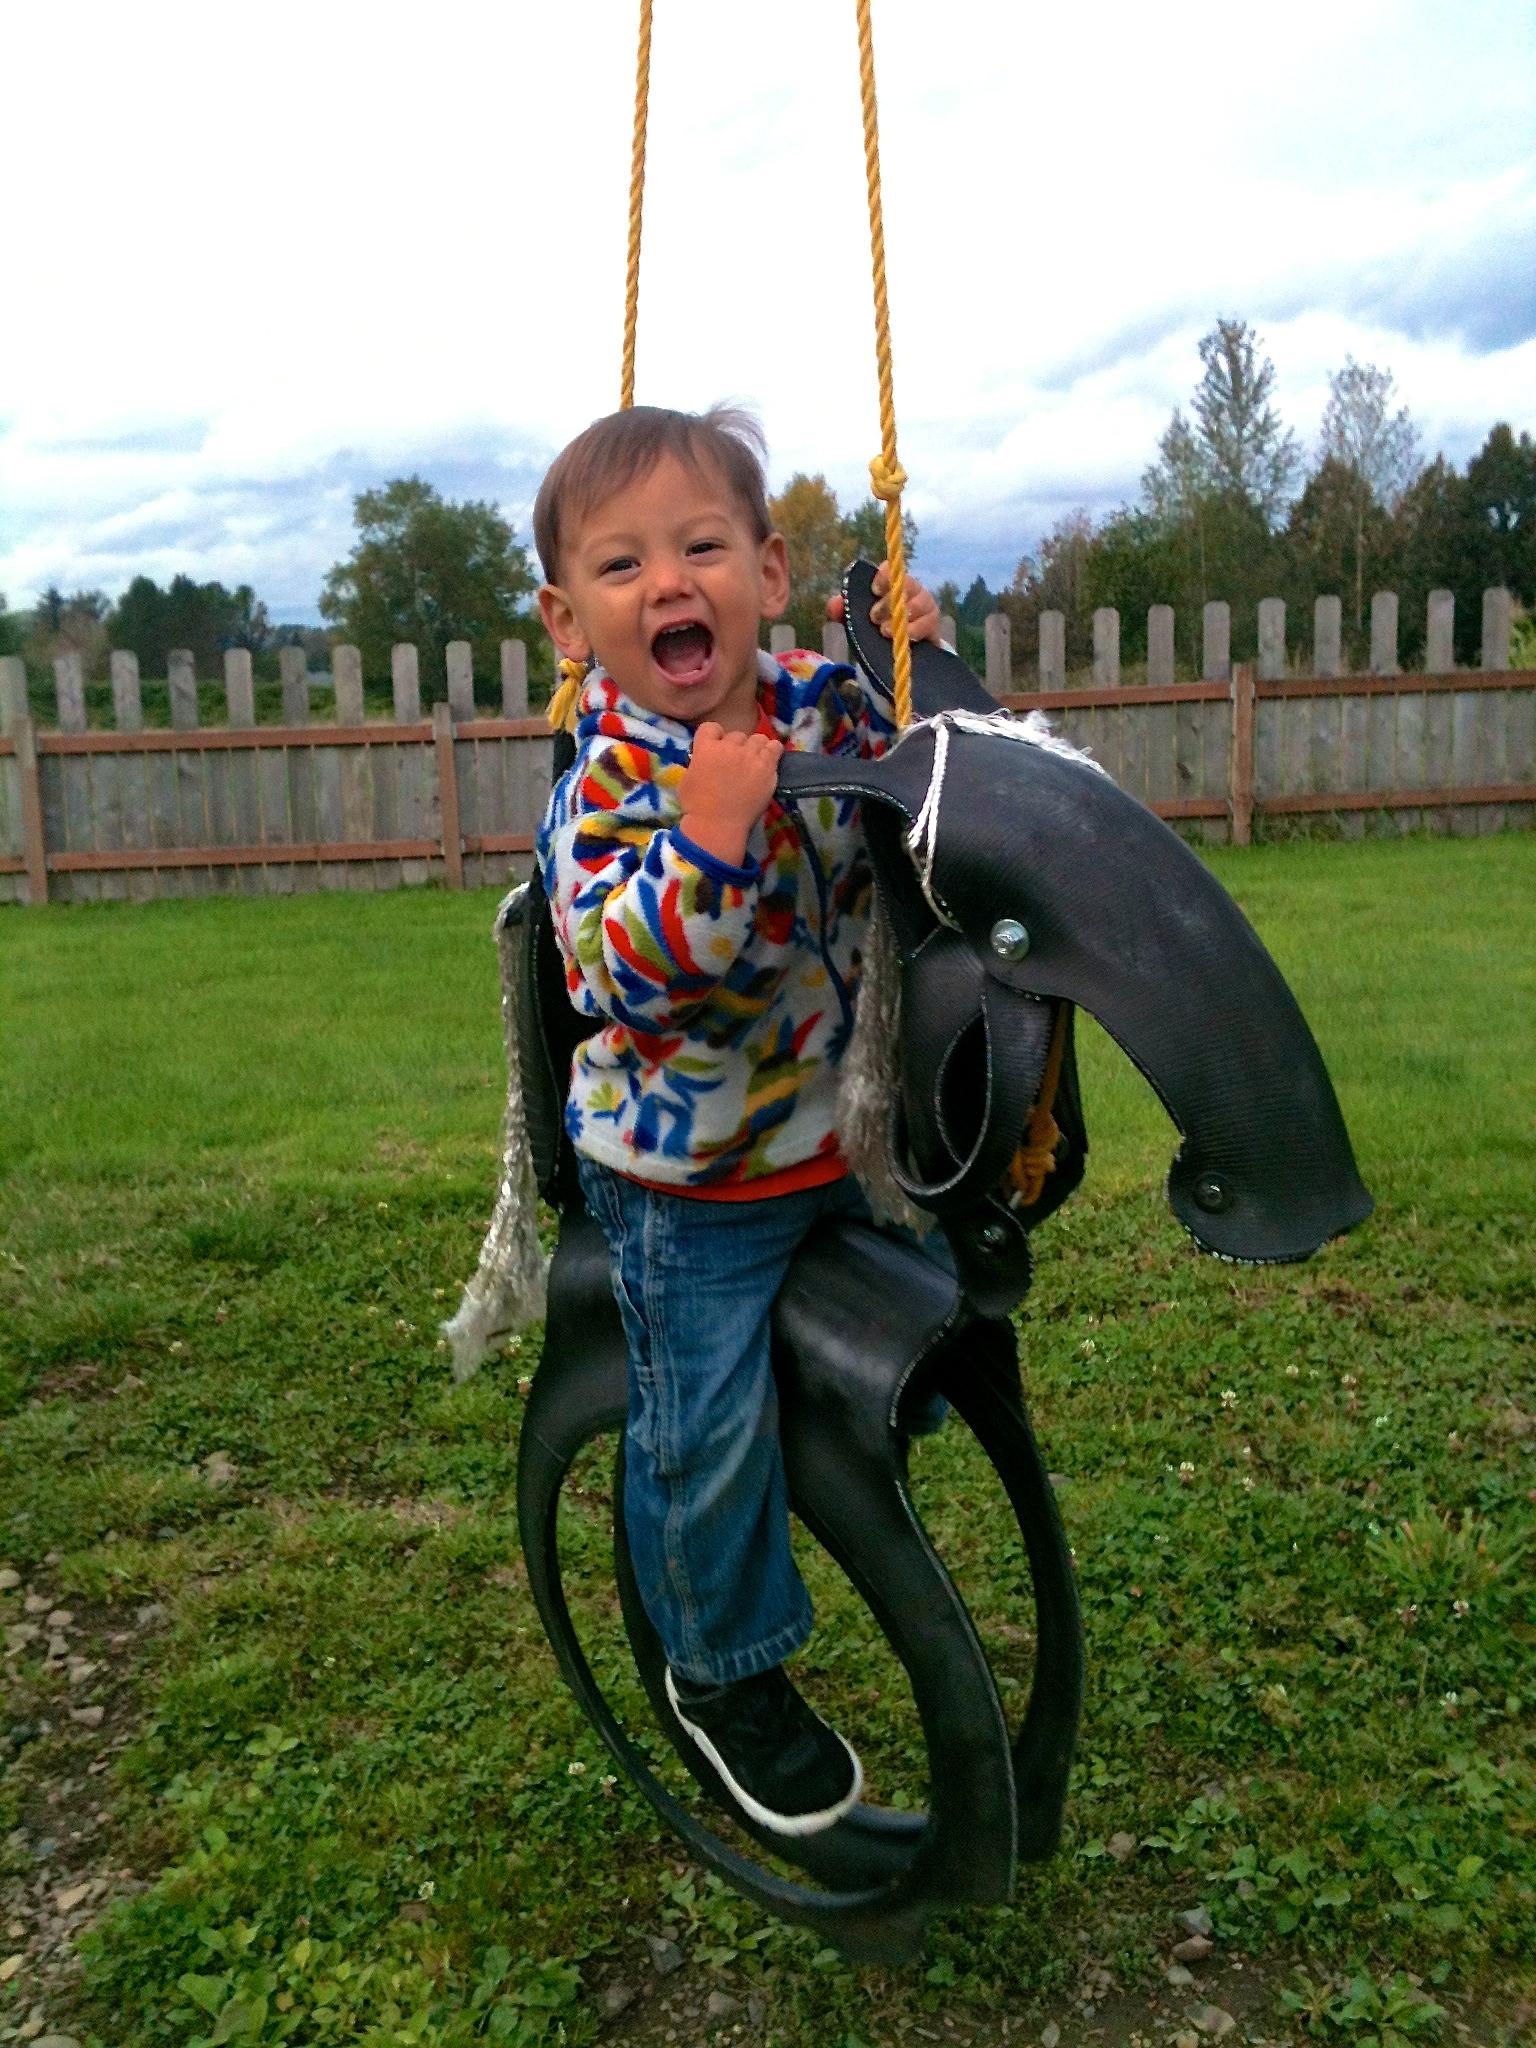 My son ridin' the cowboy way